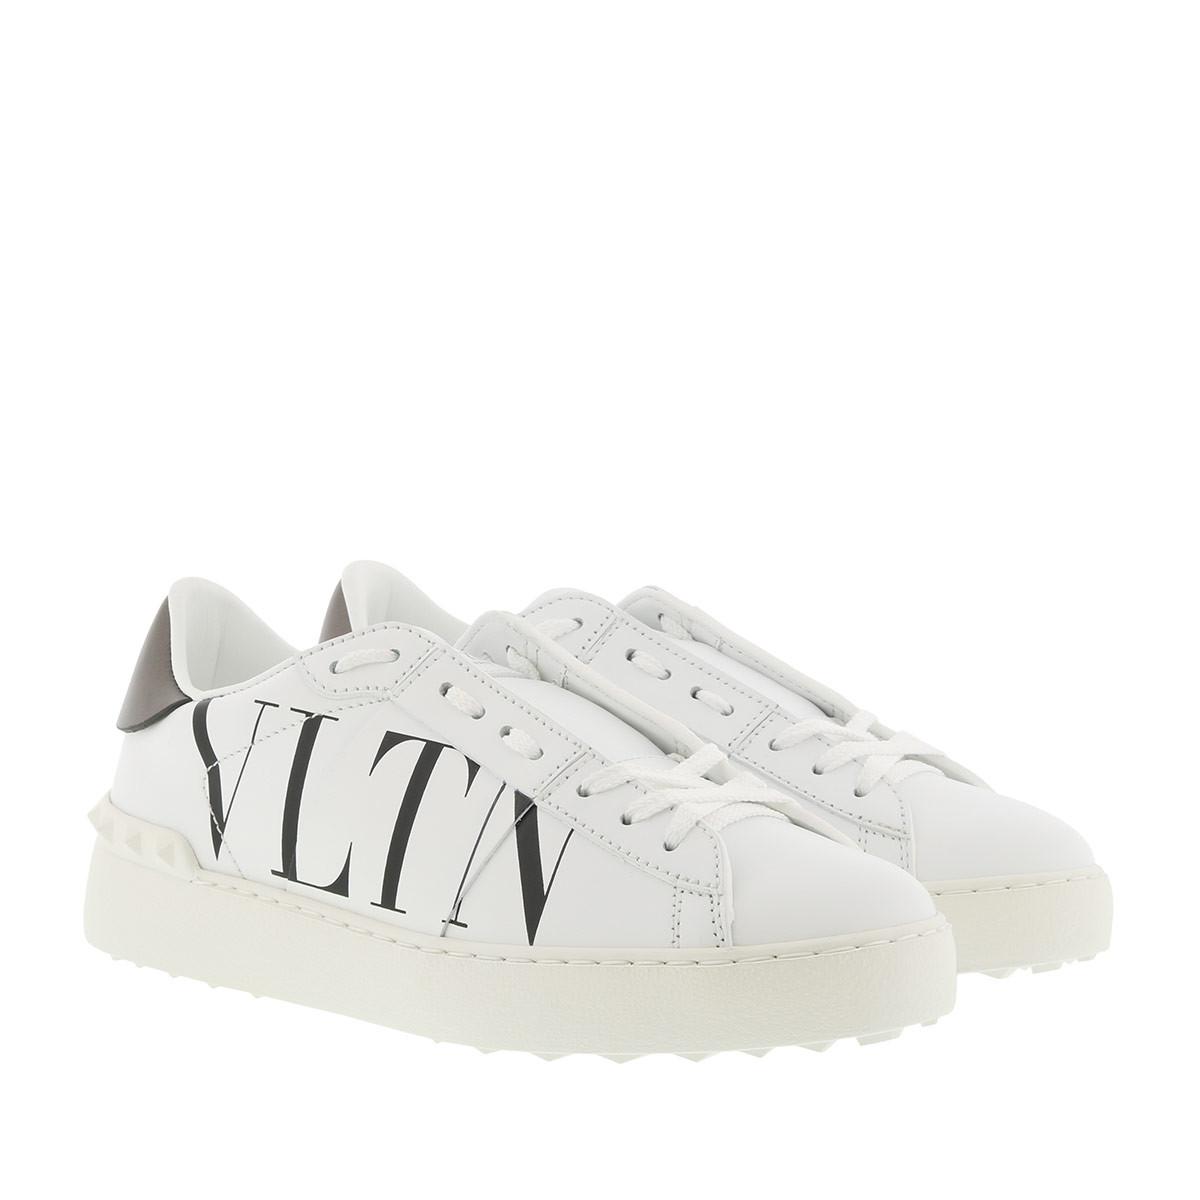 Valentino Sneakers - Valentino Bicolor Sneaker White - in weiß - für Damen